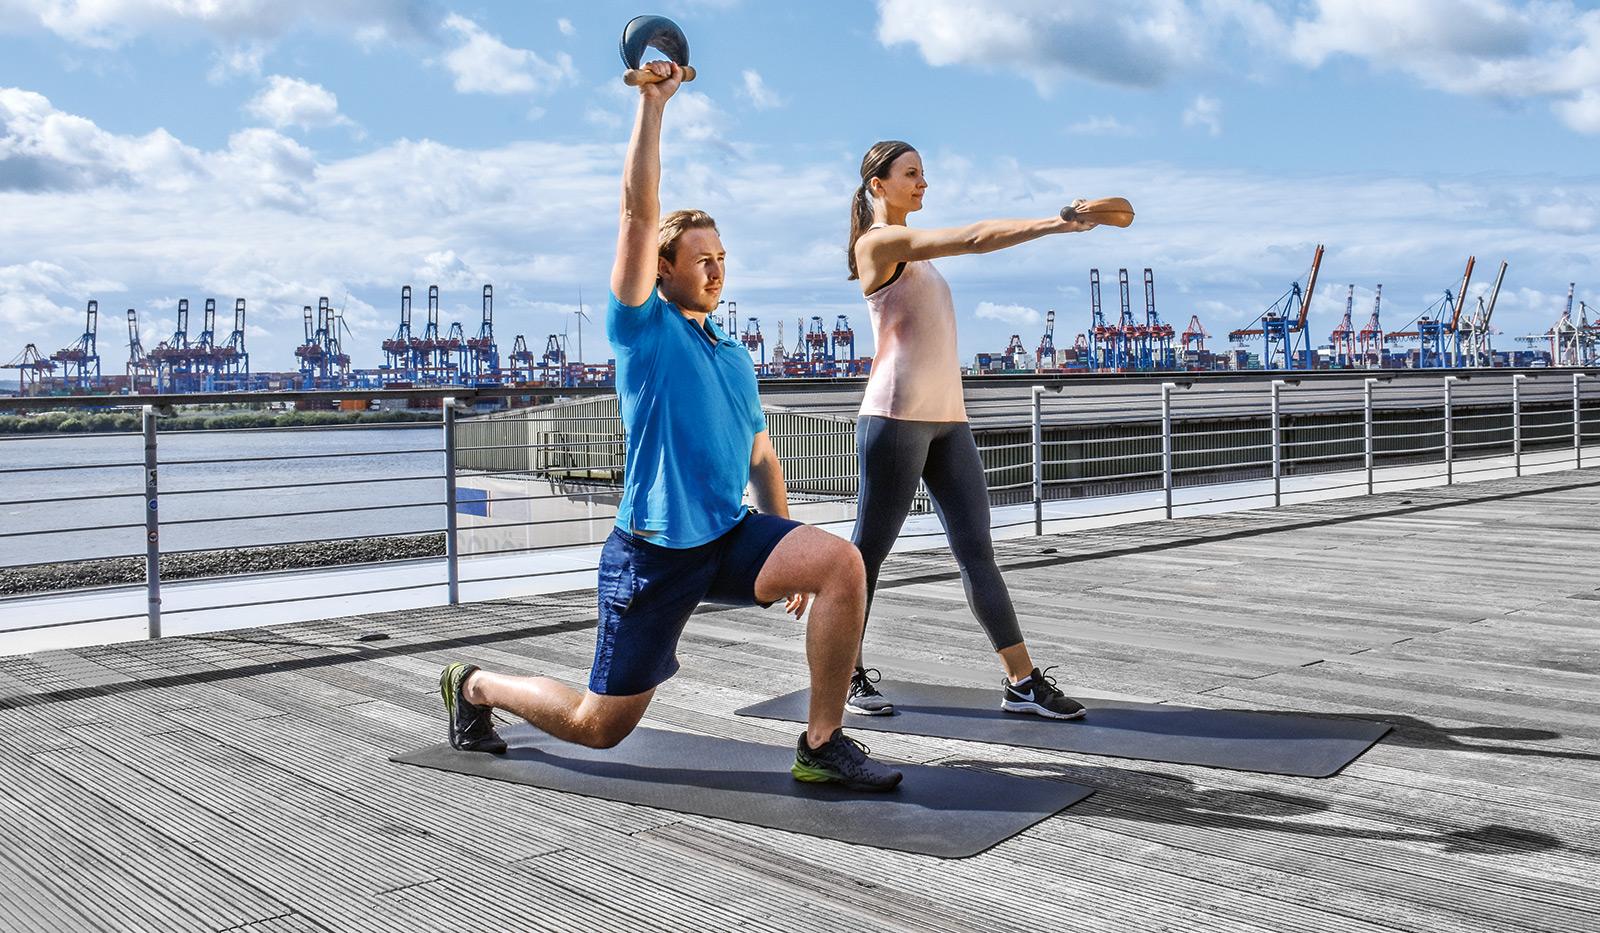 ausfallschritt - Train @ Home in Kooperation mit MONARCK Fitness